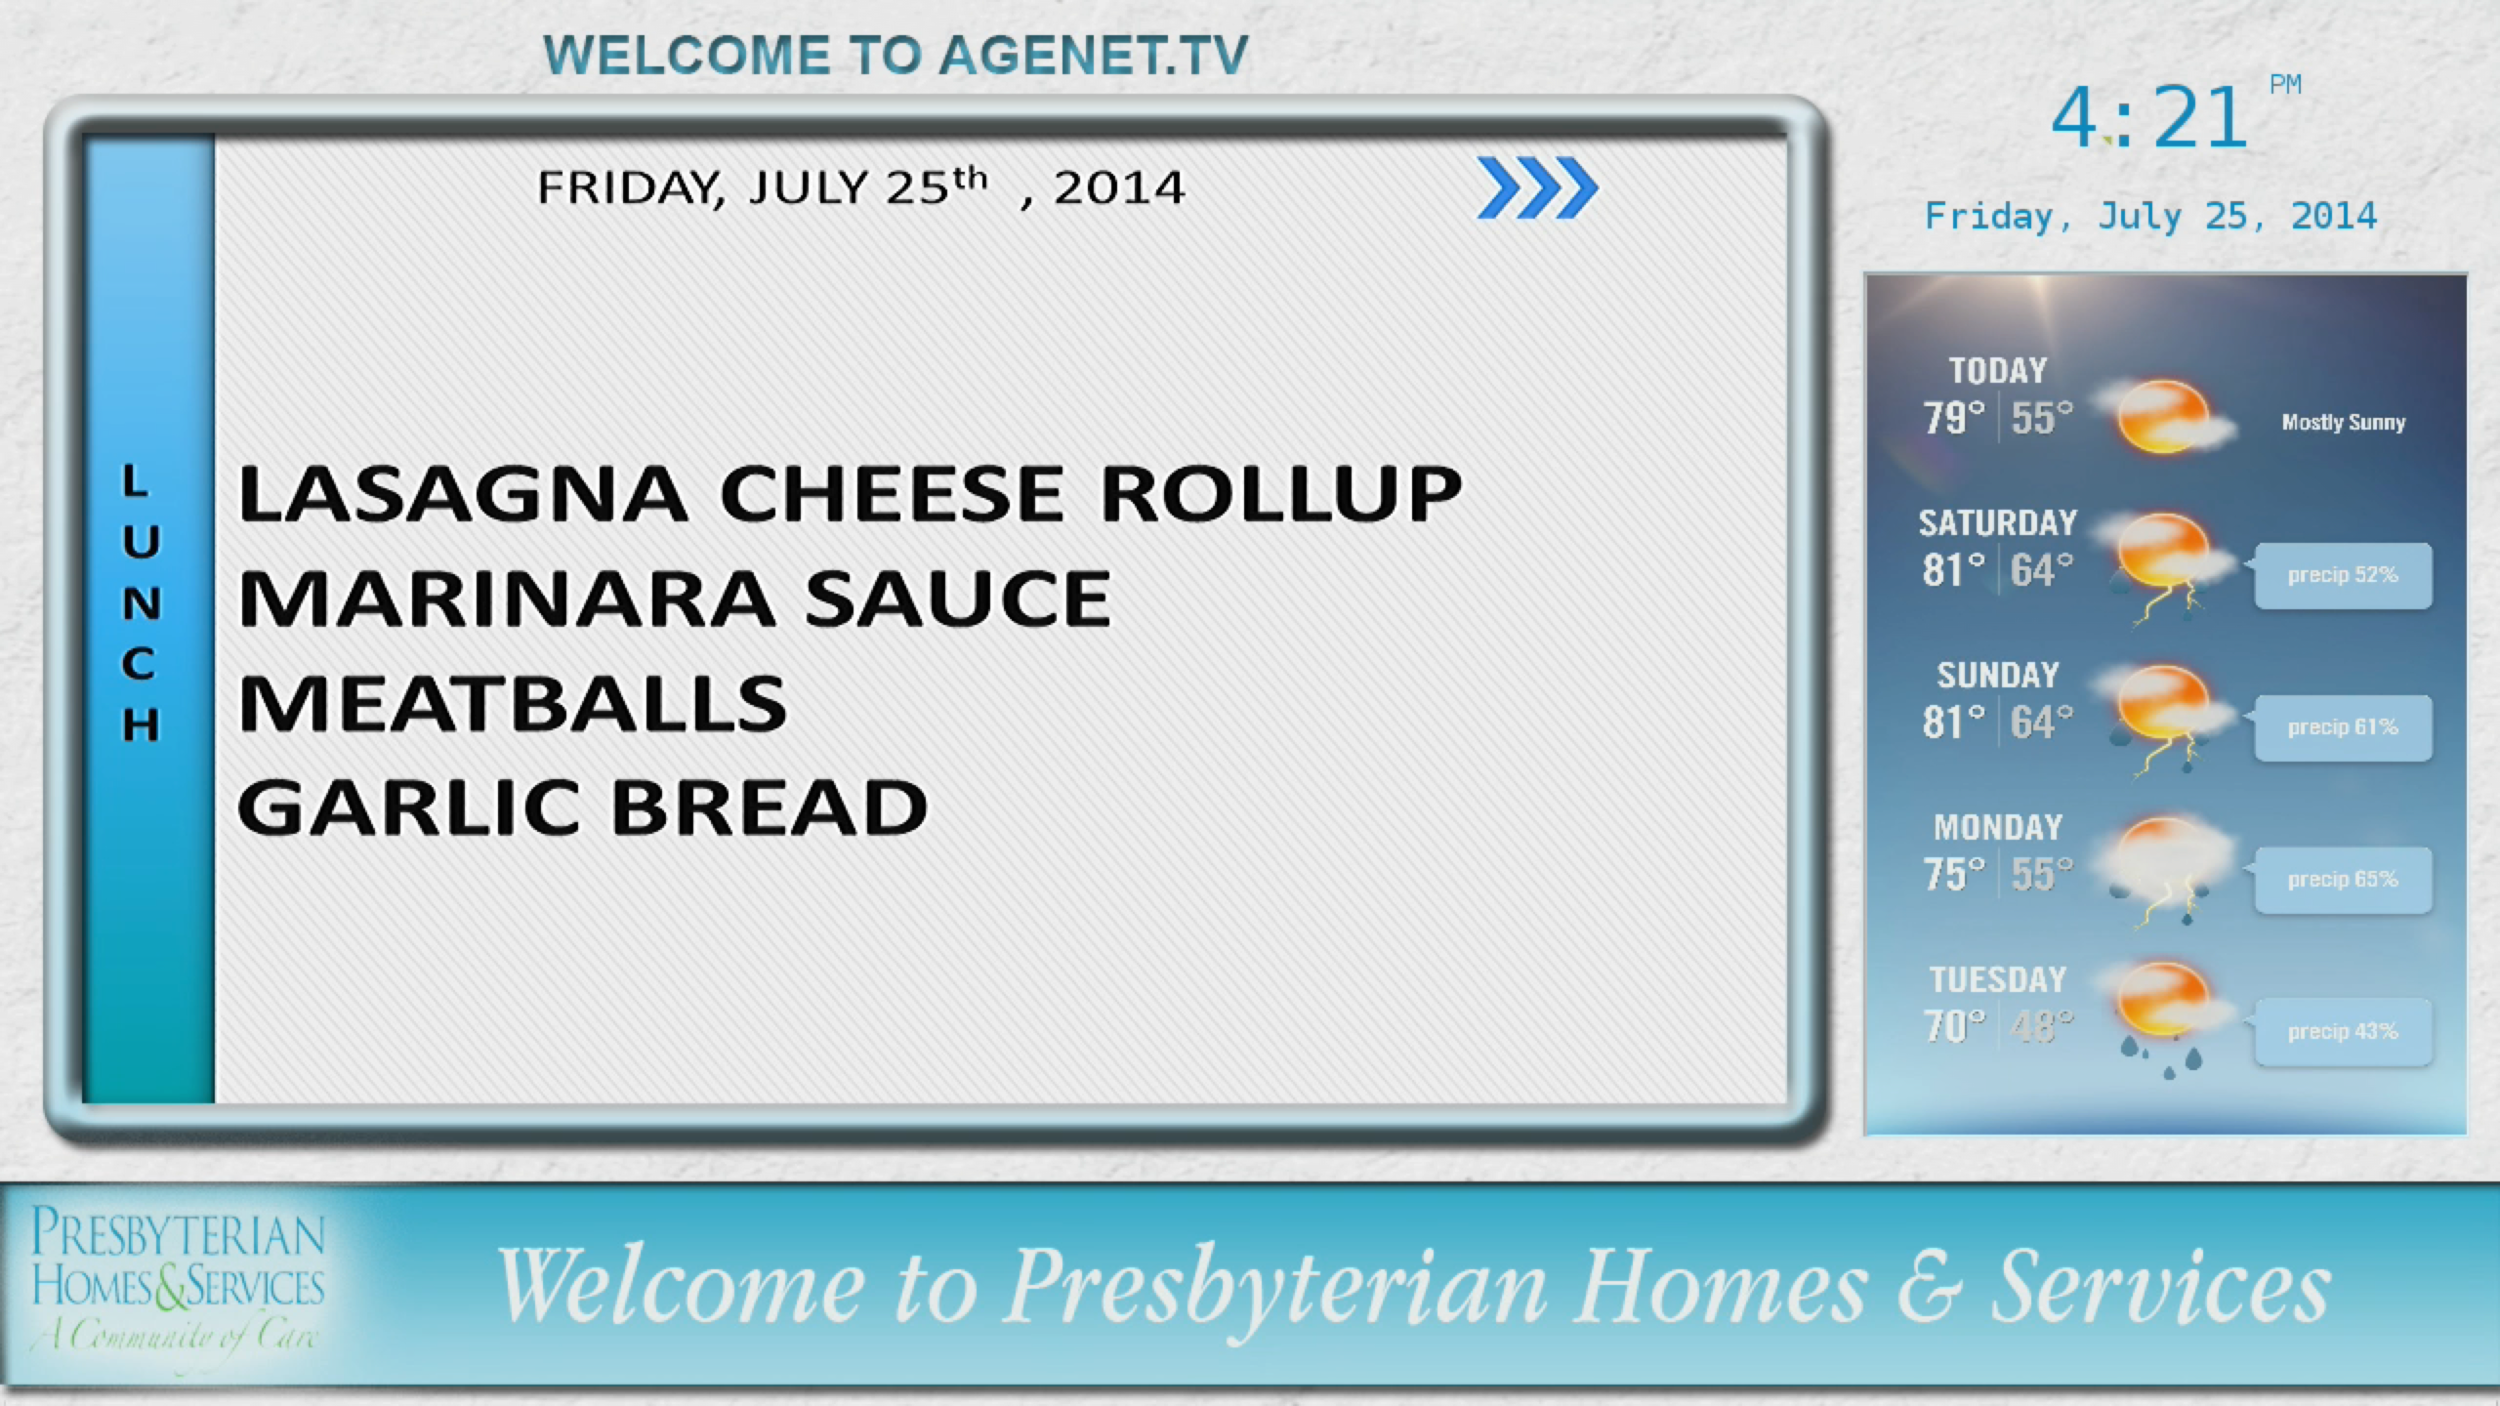 Presbyterian Homes Screen Shot 7:25:14, 4.22 PM.png